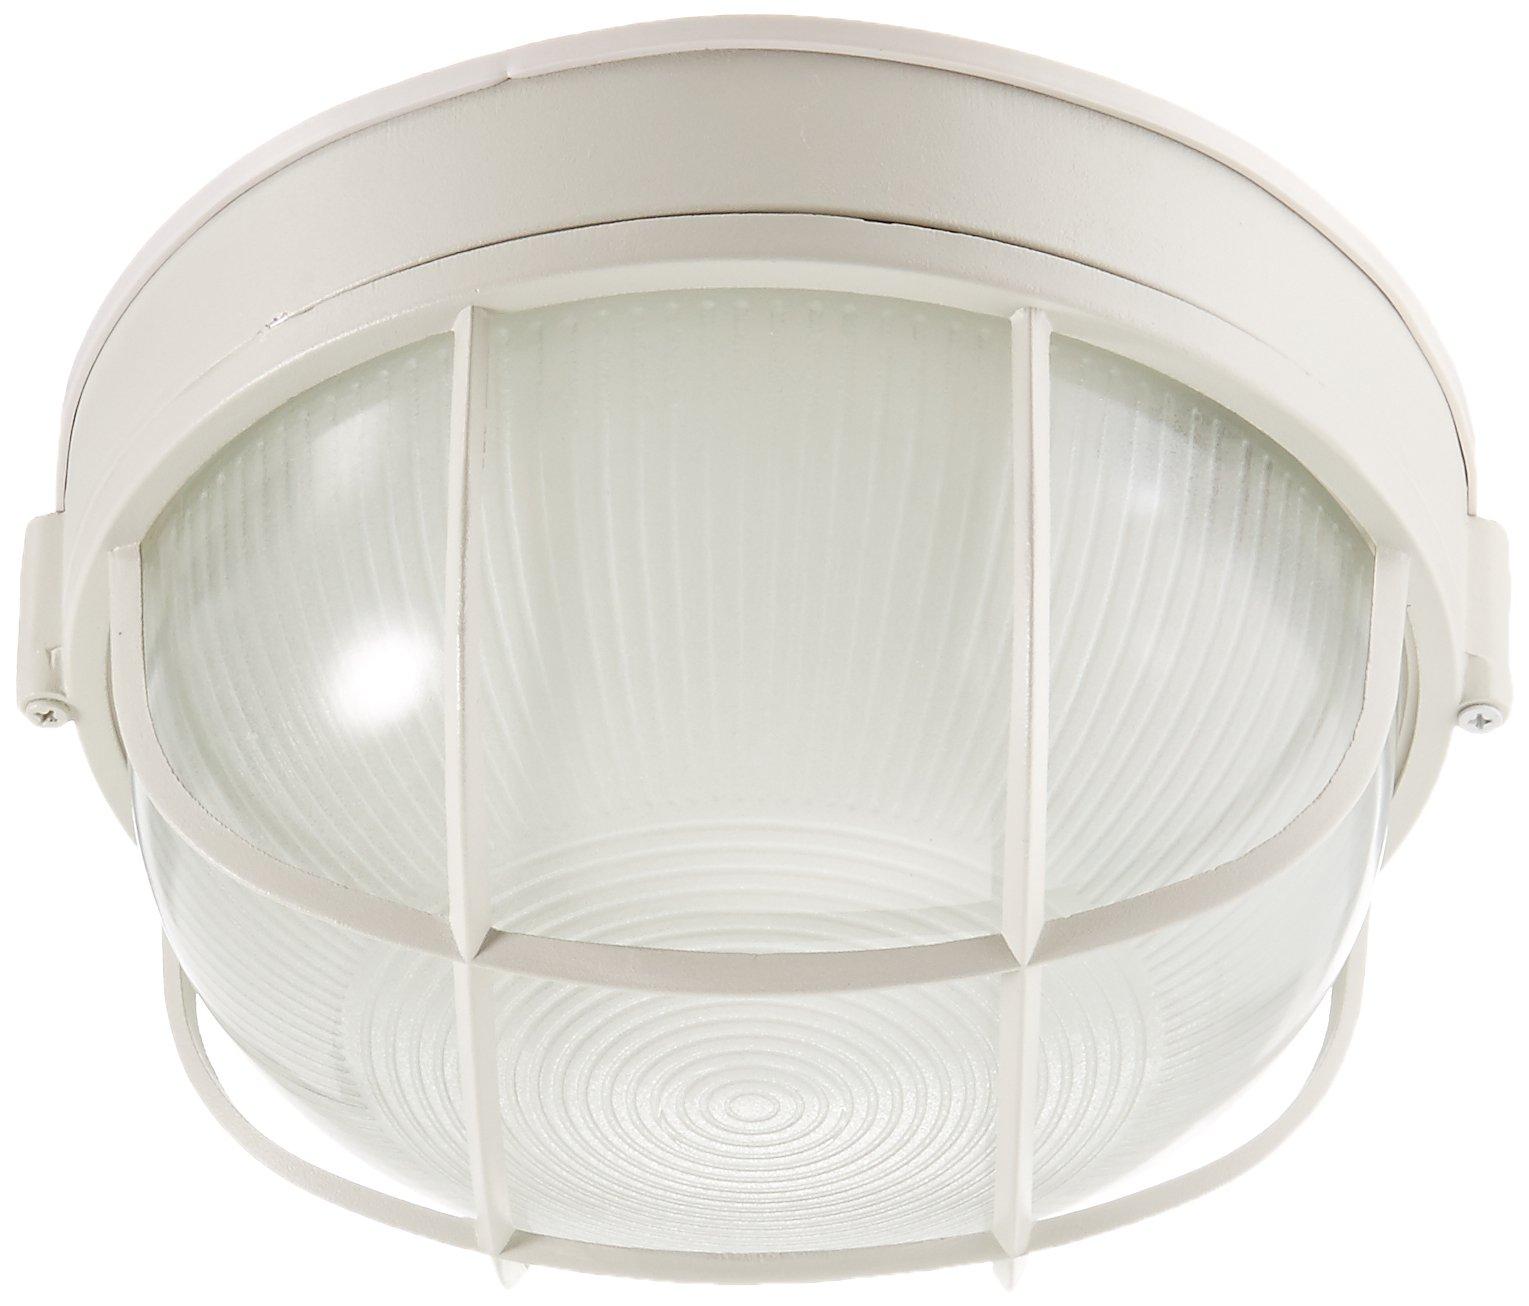 Trans Globe Lighting 41515 WH Outdoor Aria 10'' Bulkhead, White